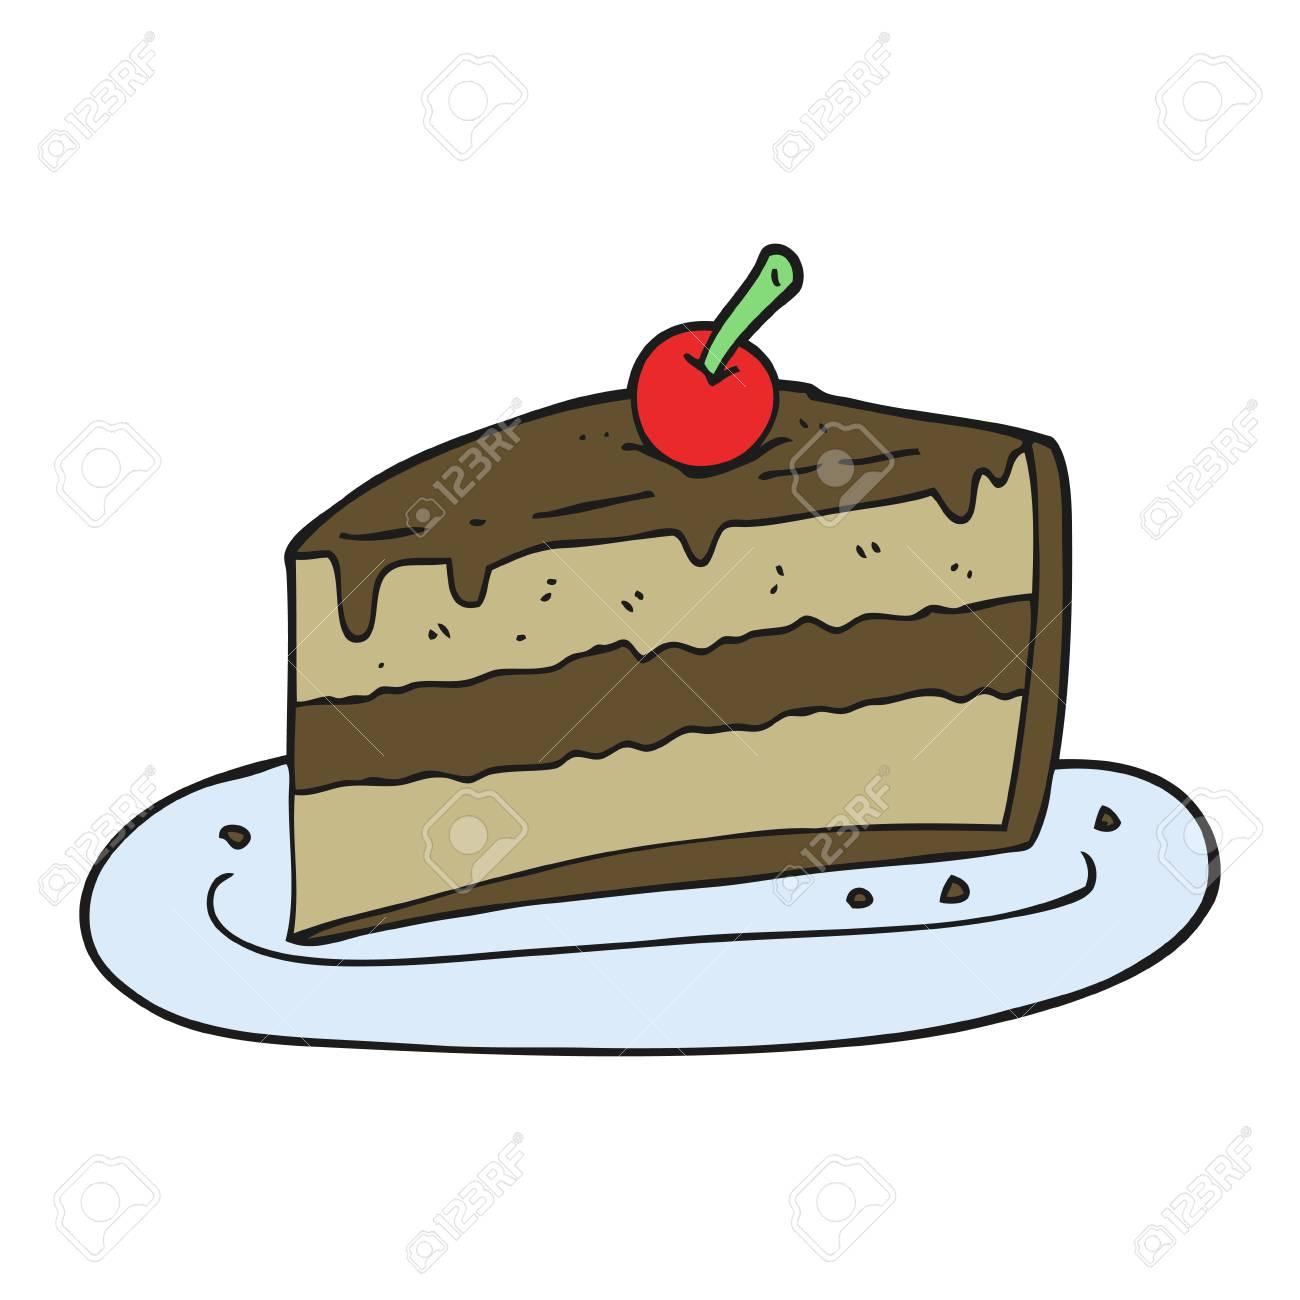 freehand drawn cartoon slice of cake.